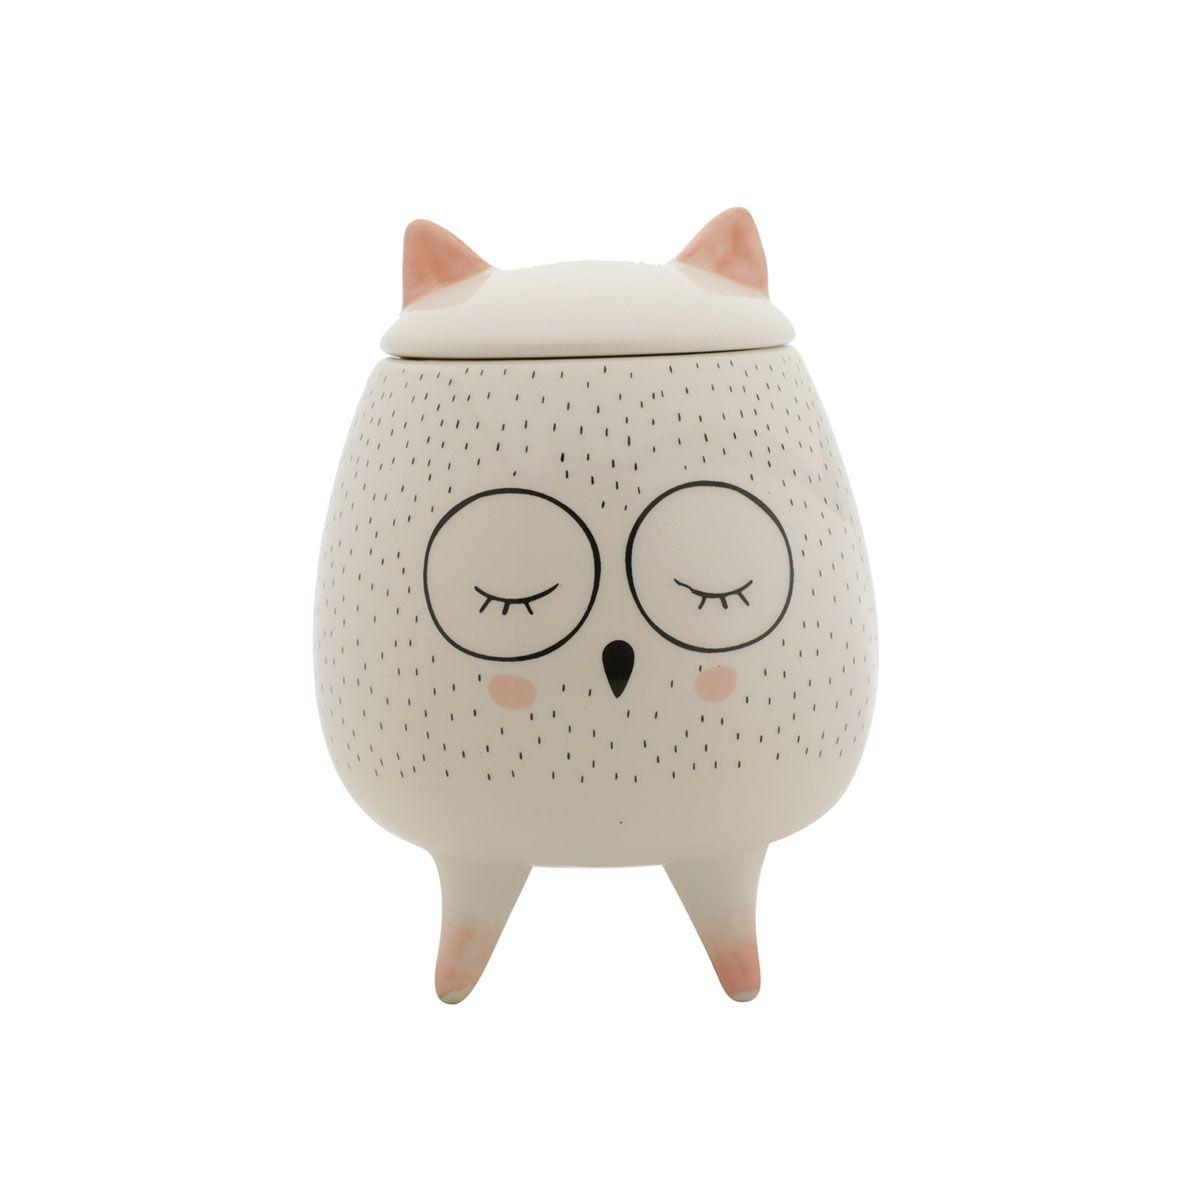 Vaso Potiche Decorativo Cerâmica Coruja Sleeping Owl